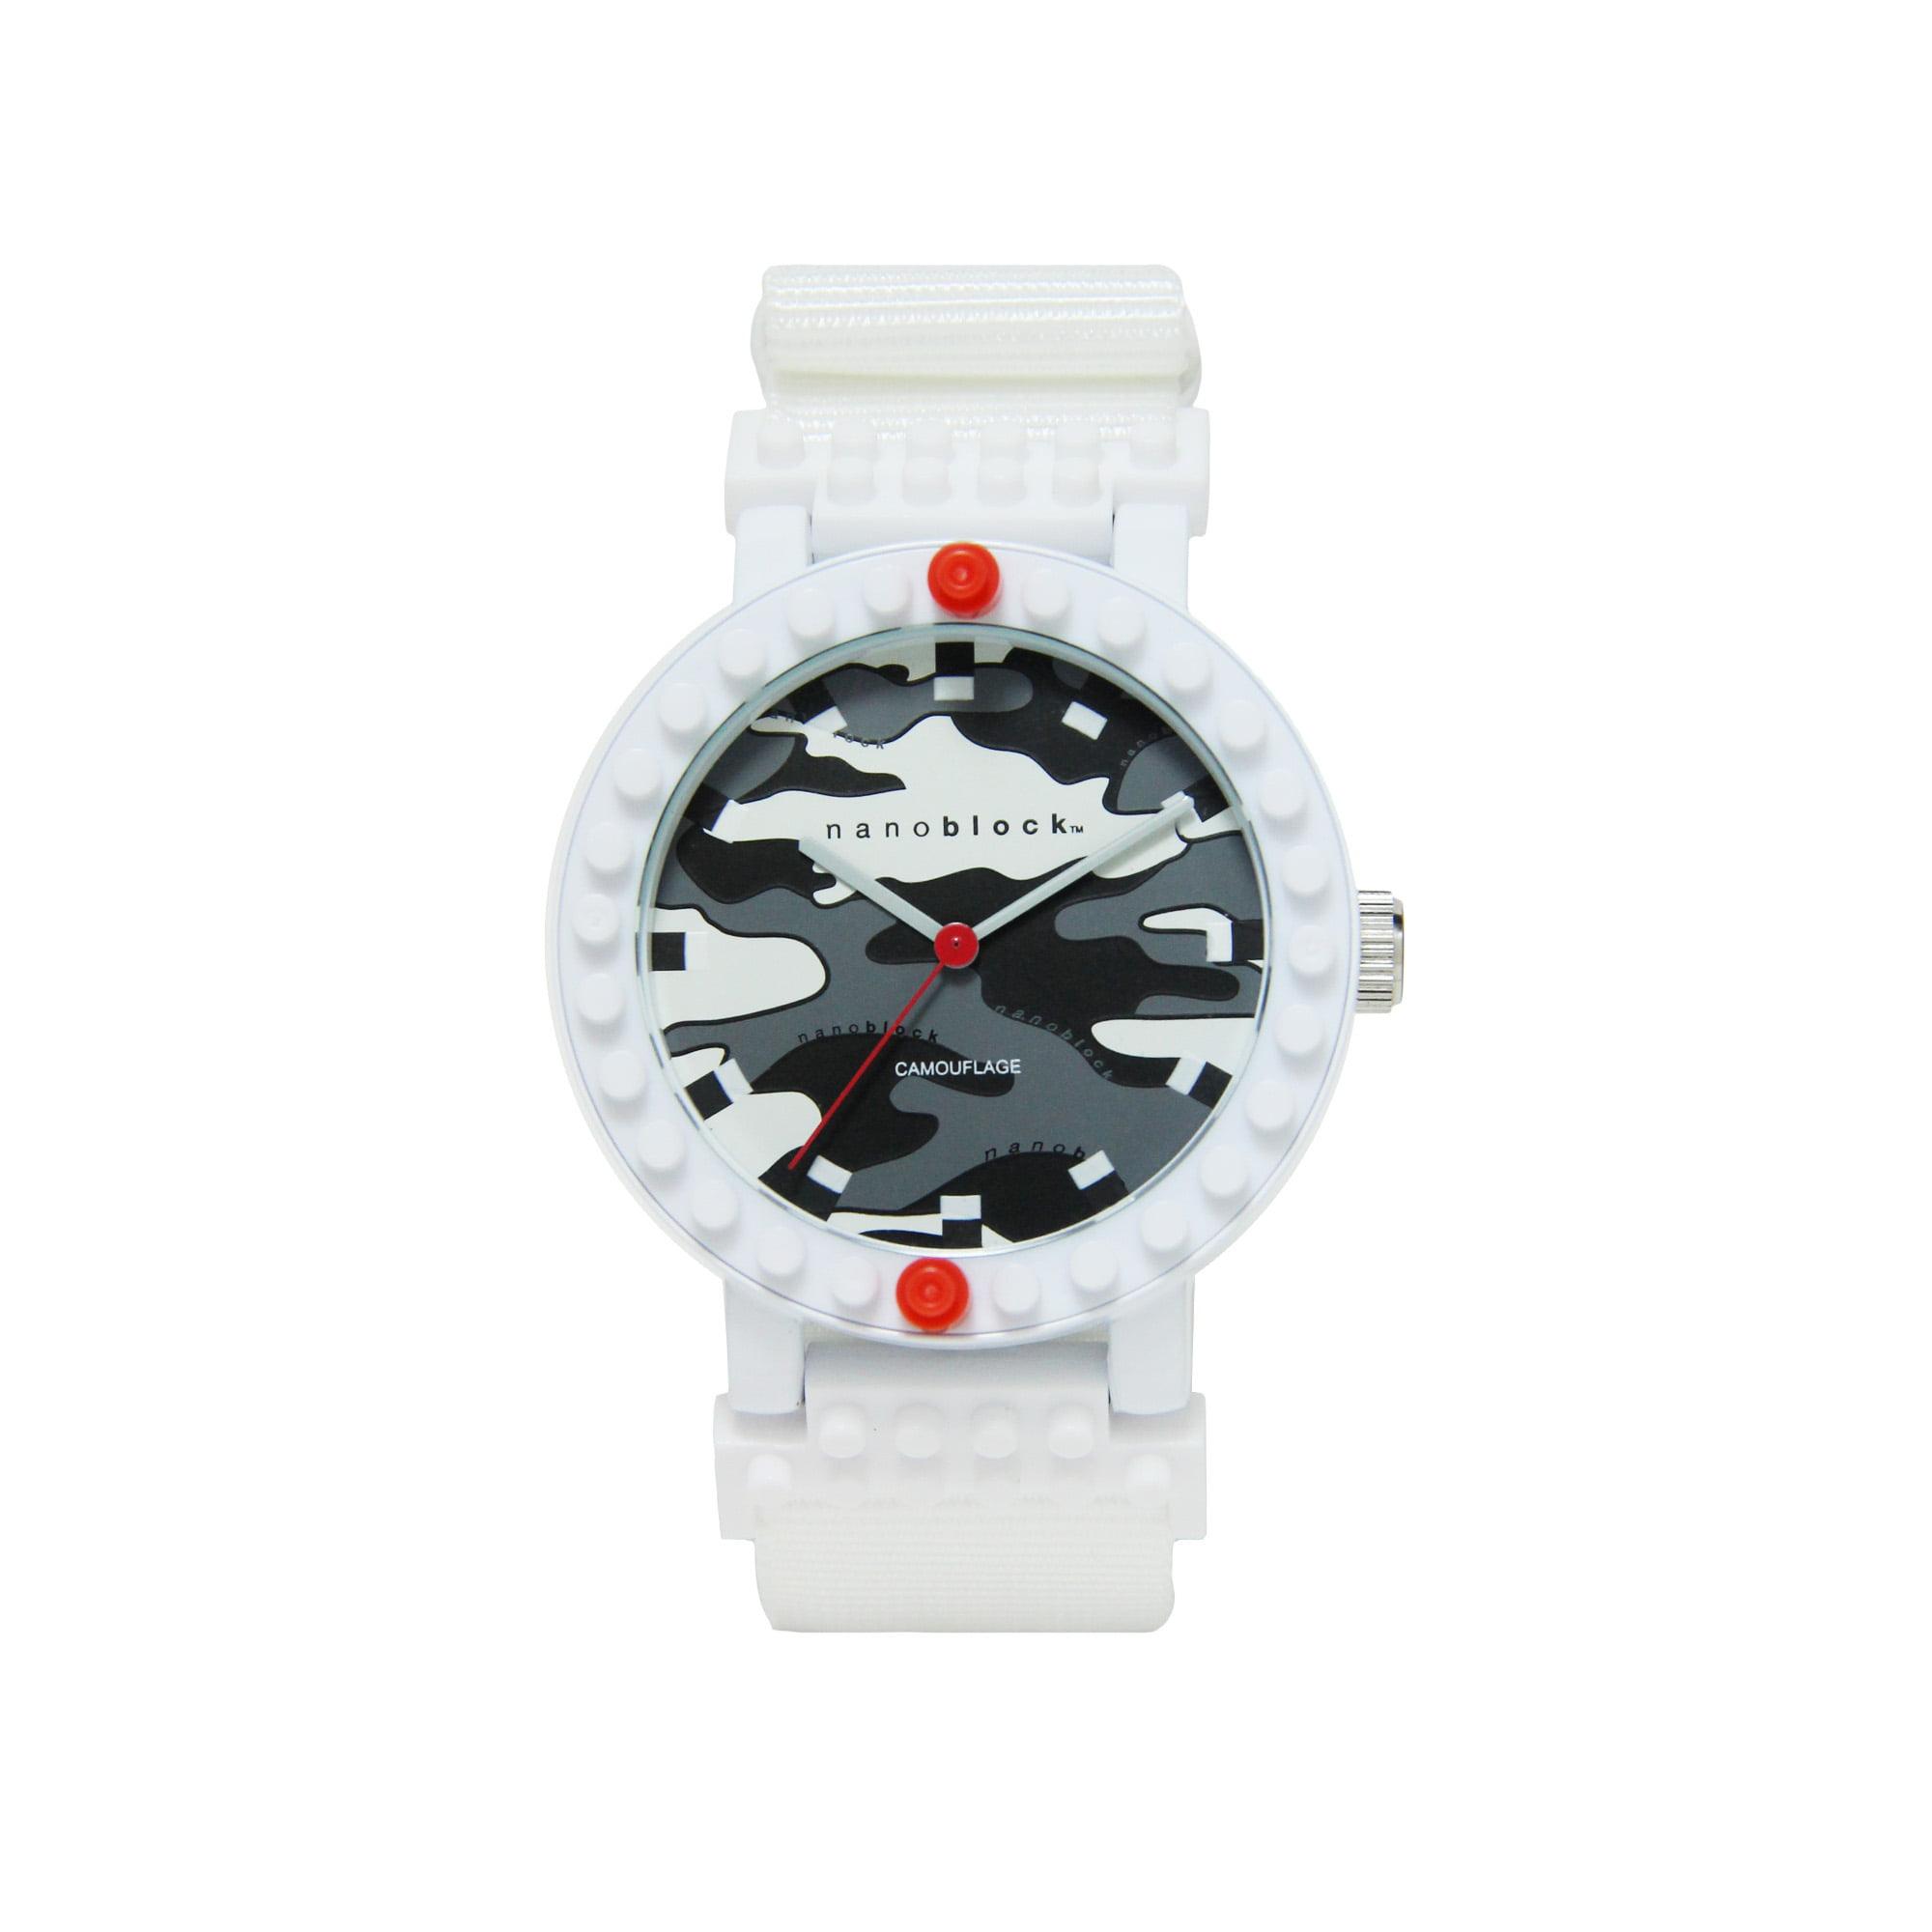 Nanoblocktime All Rounder Camo Watch, White by Nanoblocktime